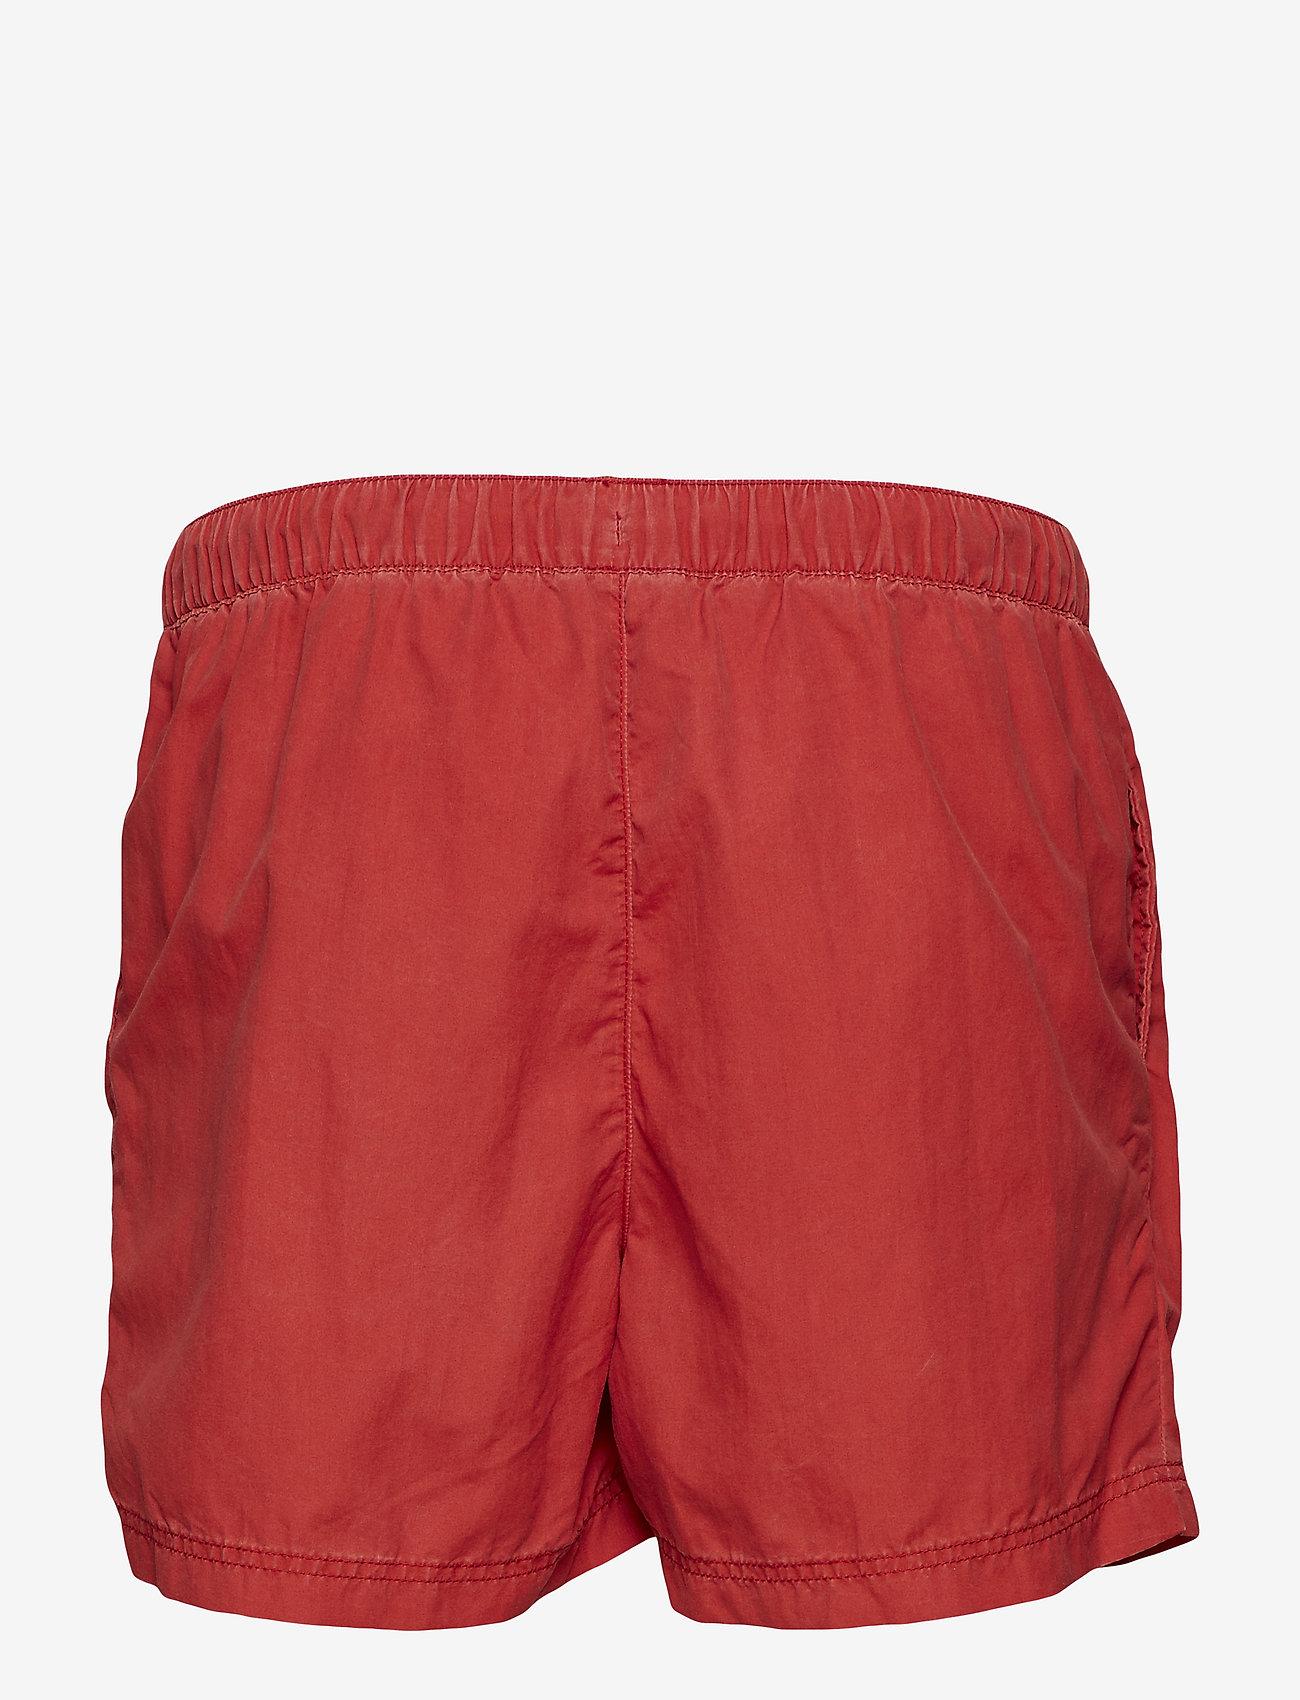 Selected Homme - SHHCLASSIC WASHED SWIMSHORTS - swim shorts - pompeian red